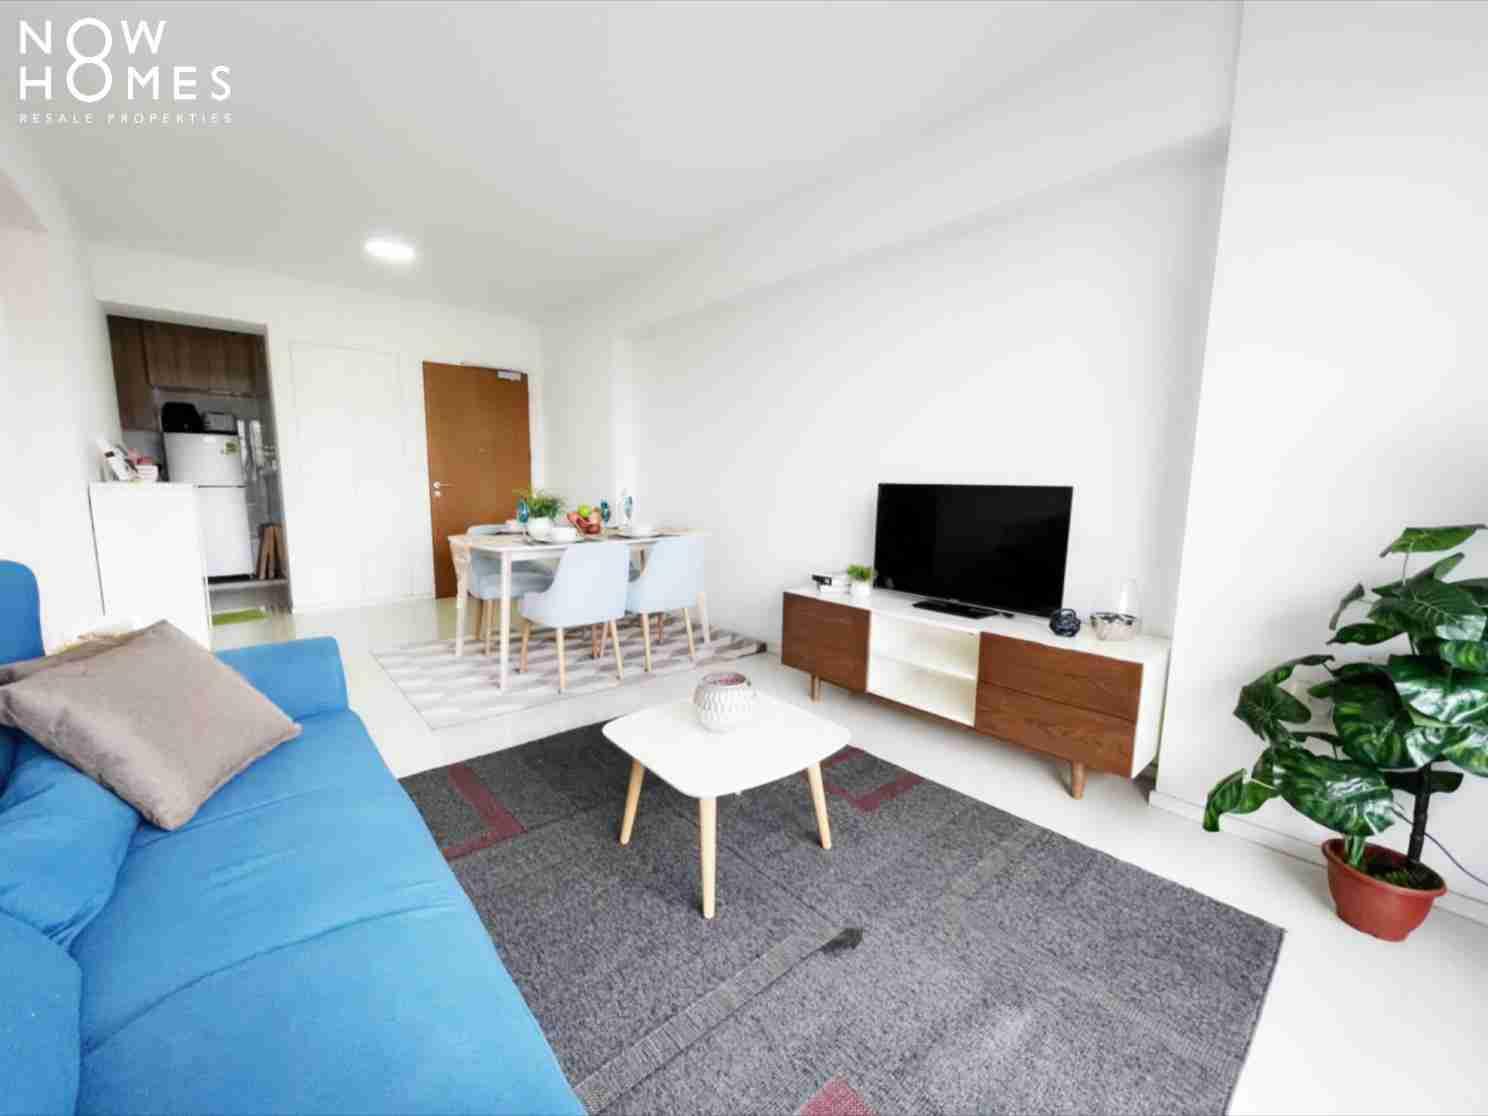 punggol resale property - 310B Punggol Walk - Living Room Kitchen View